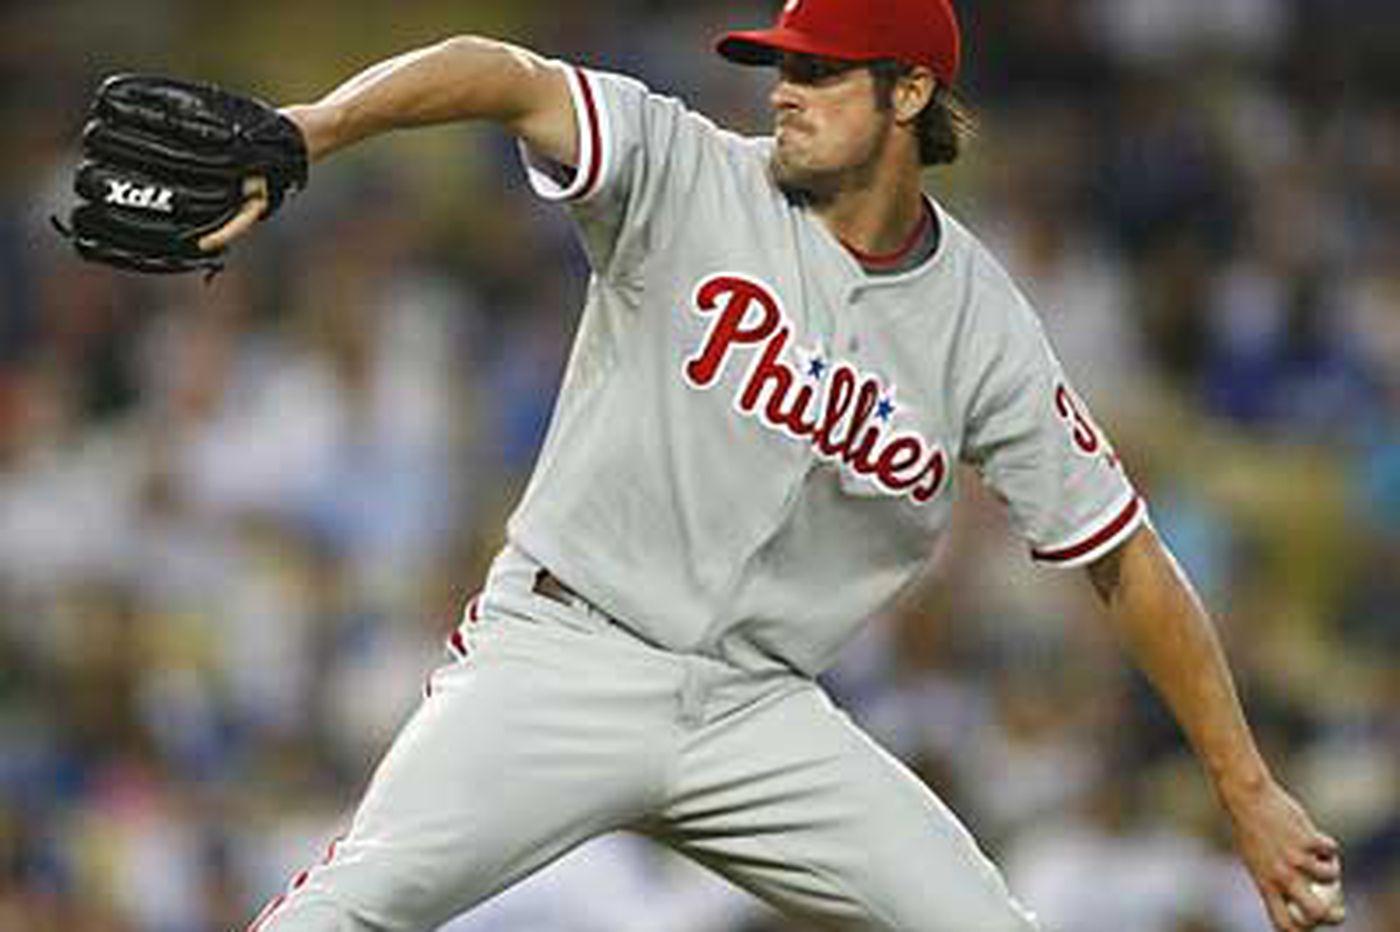 Hamels lacking run support again as Dodgers stun Phillies